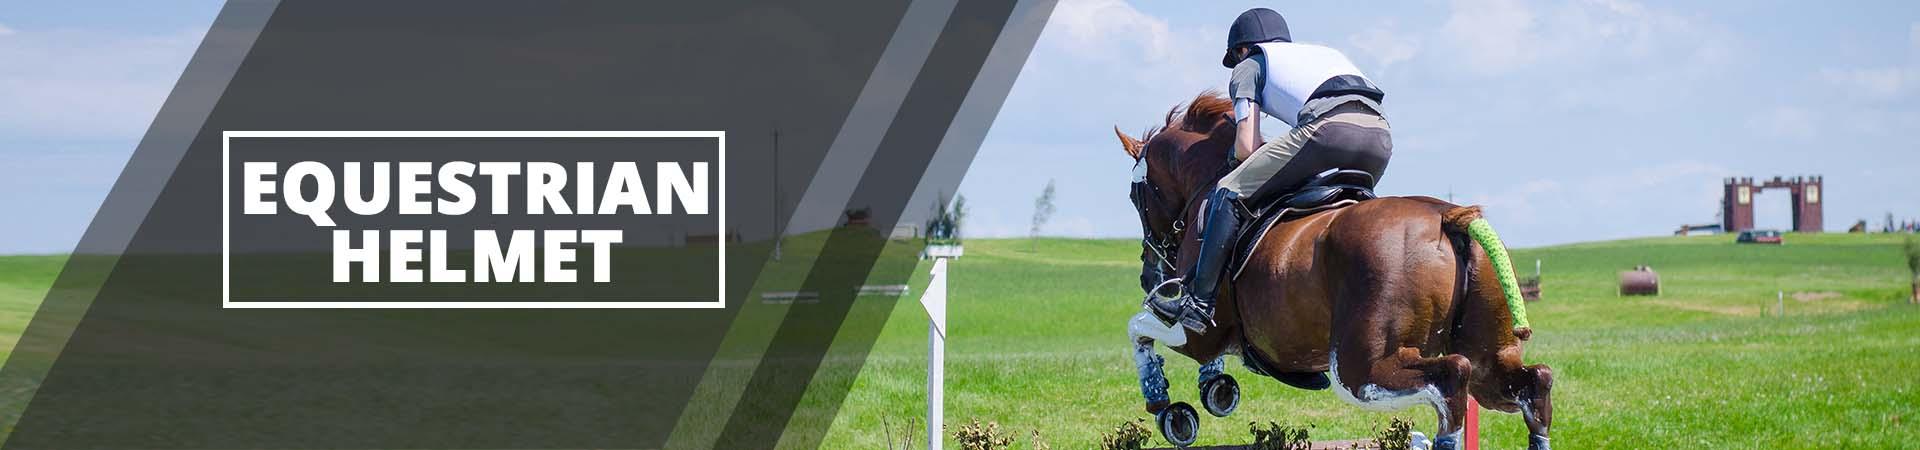 equestrian-helmet